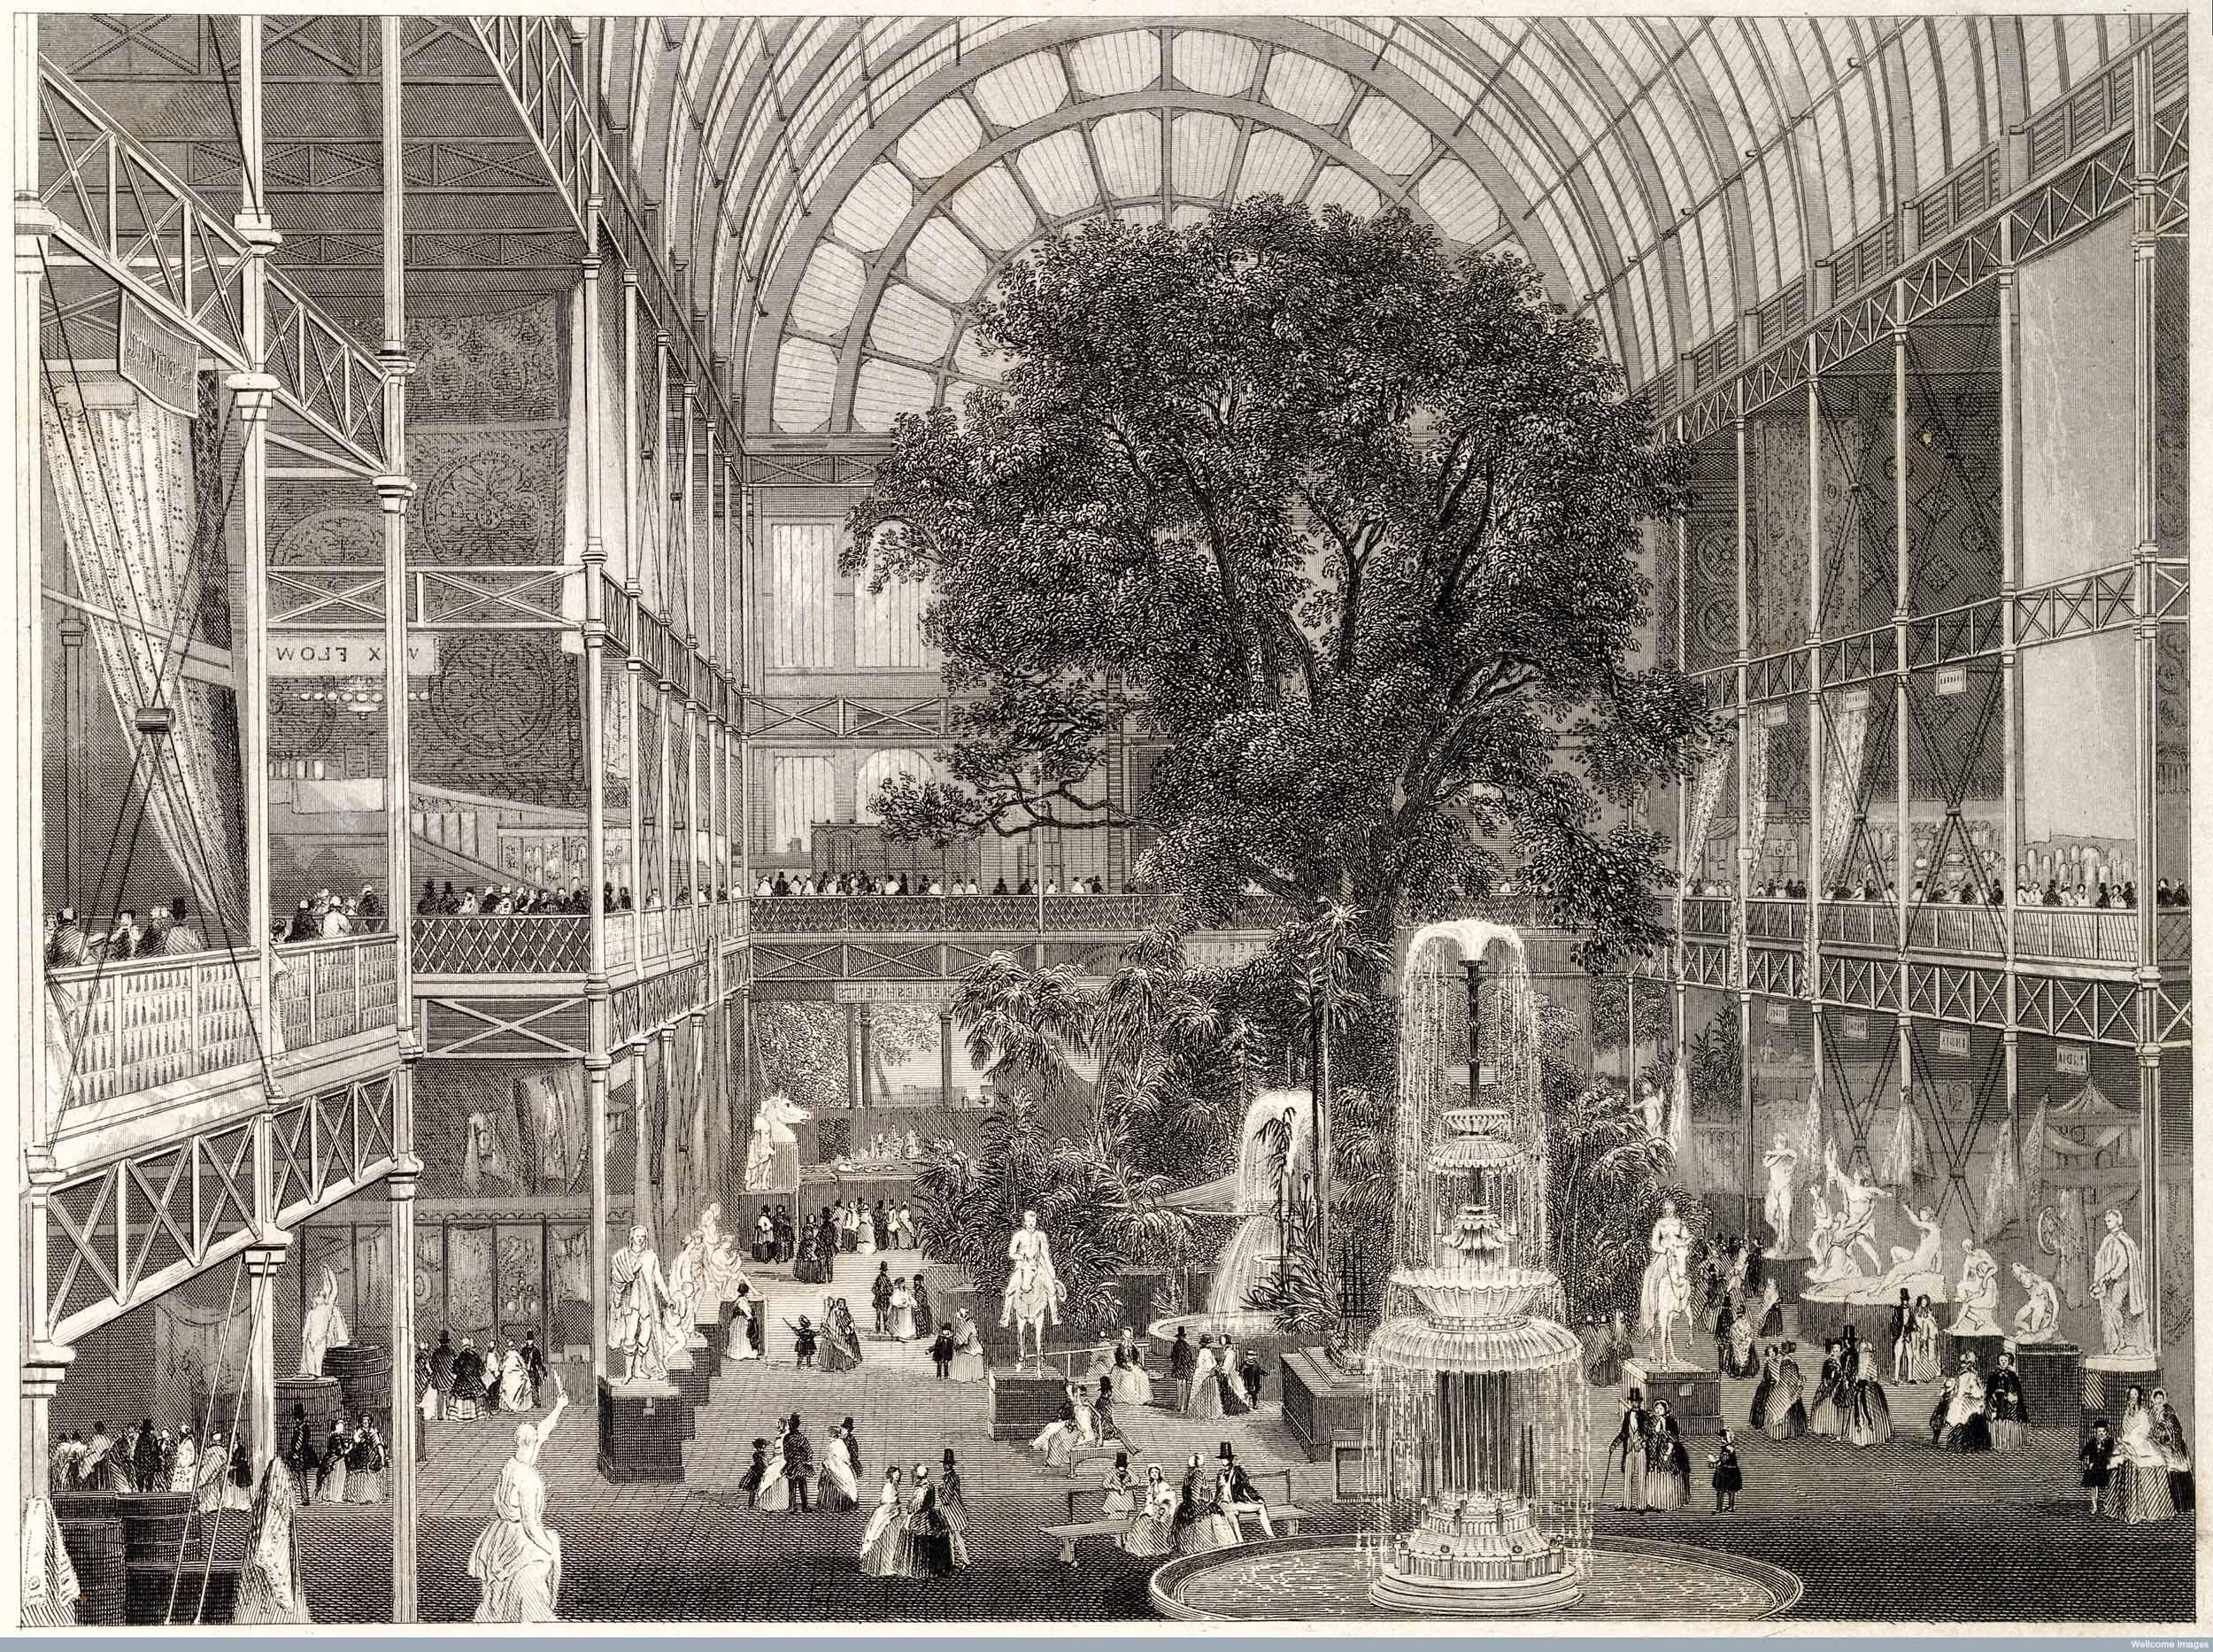 Medicine in the 19th Century - Strange Victorian Era Cures